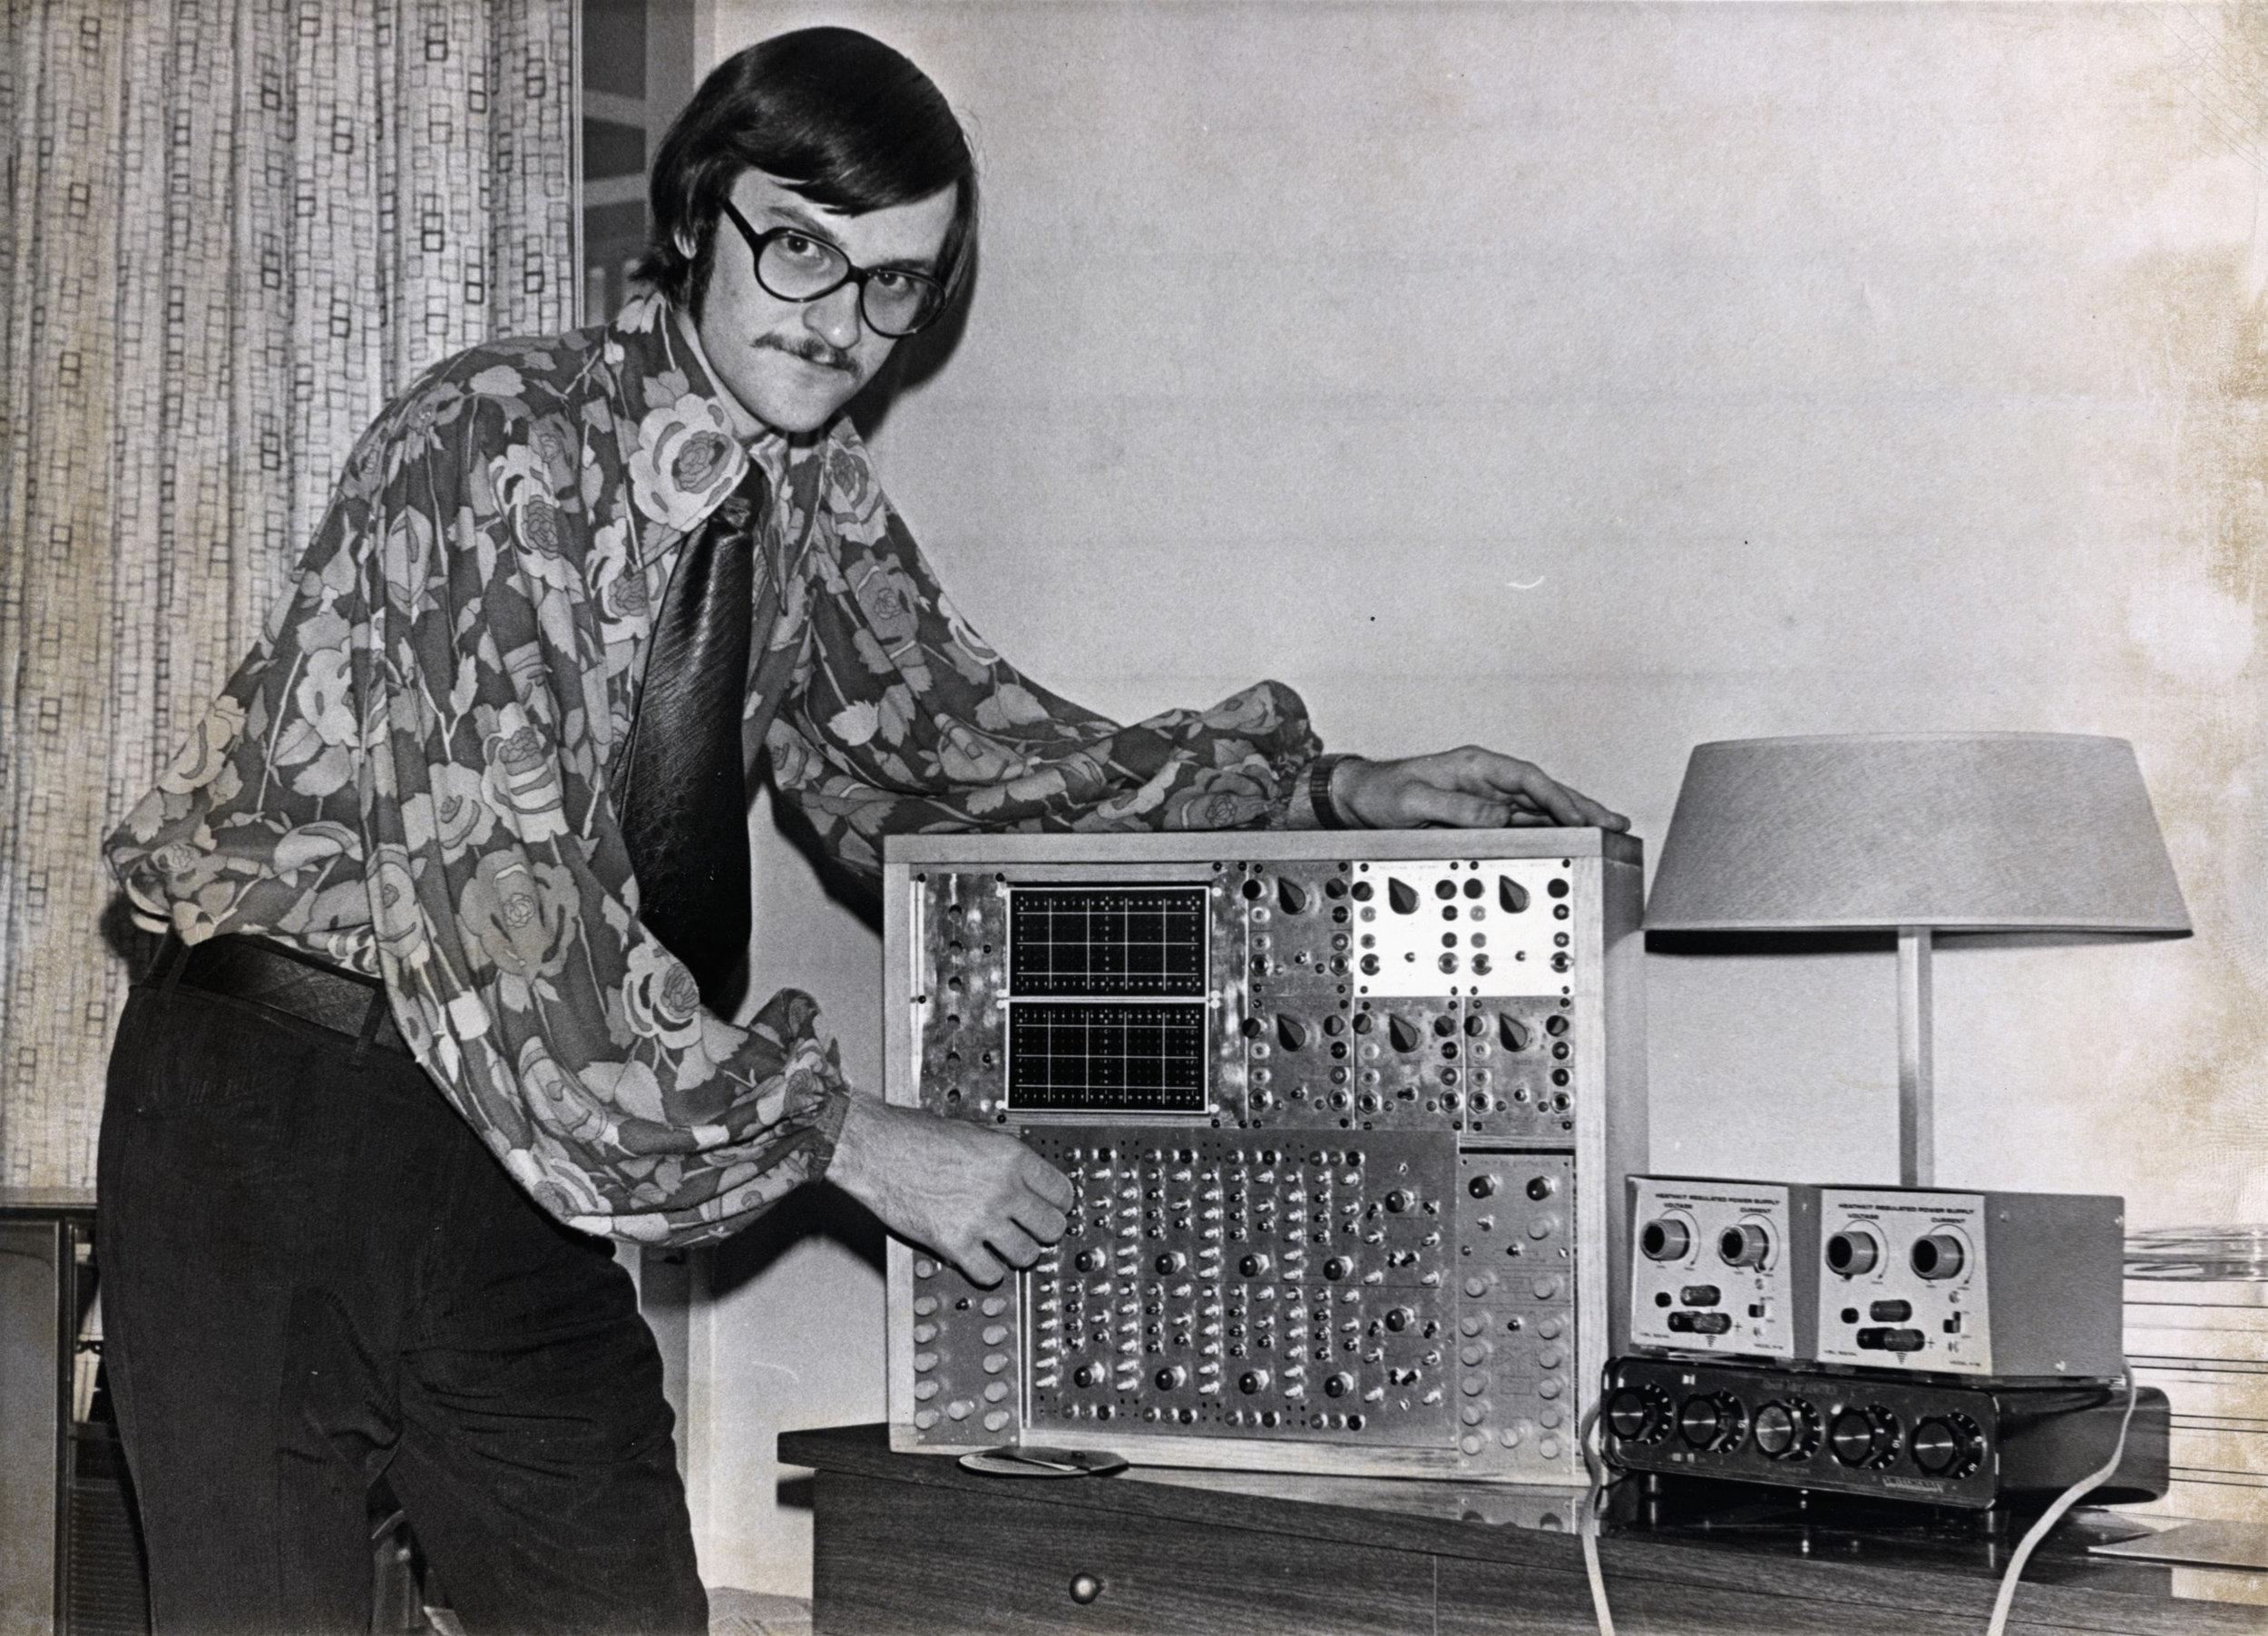 Rosenboom w_Neurona 70s.jpg